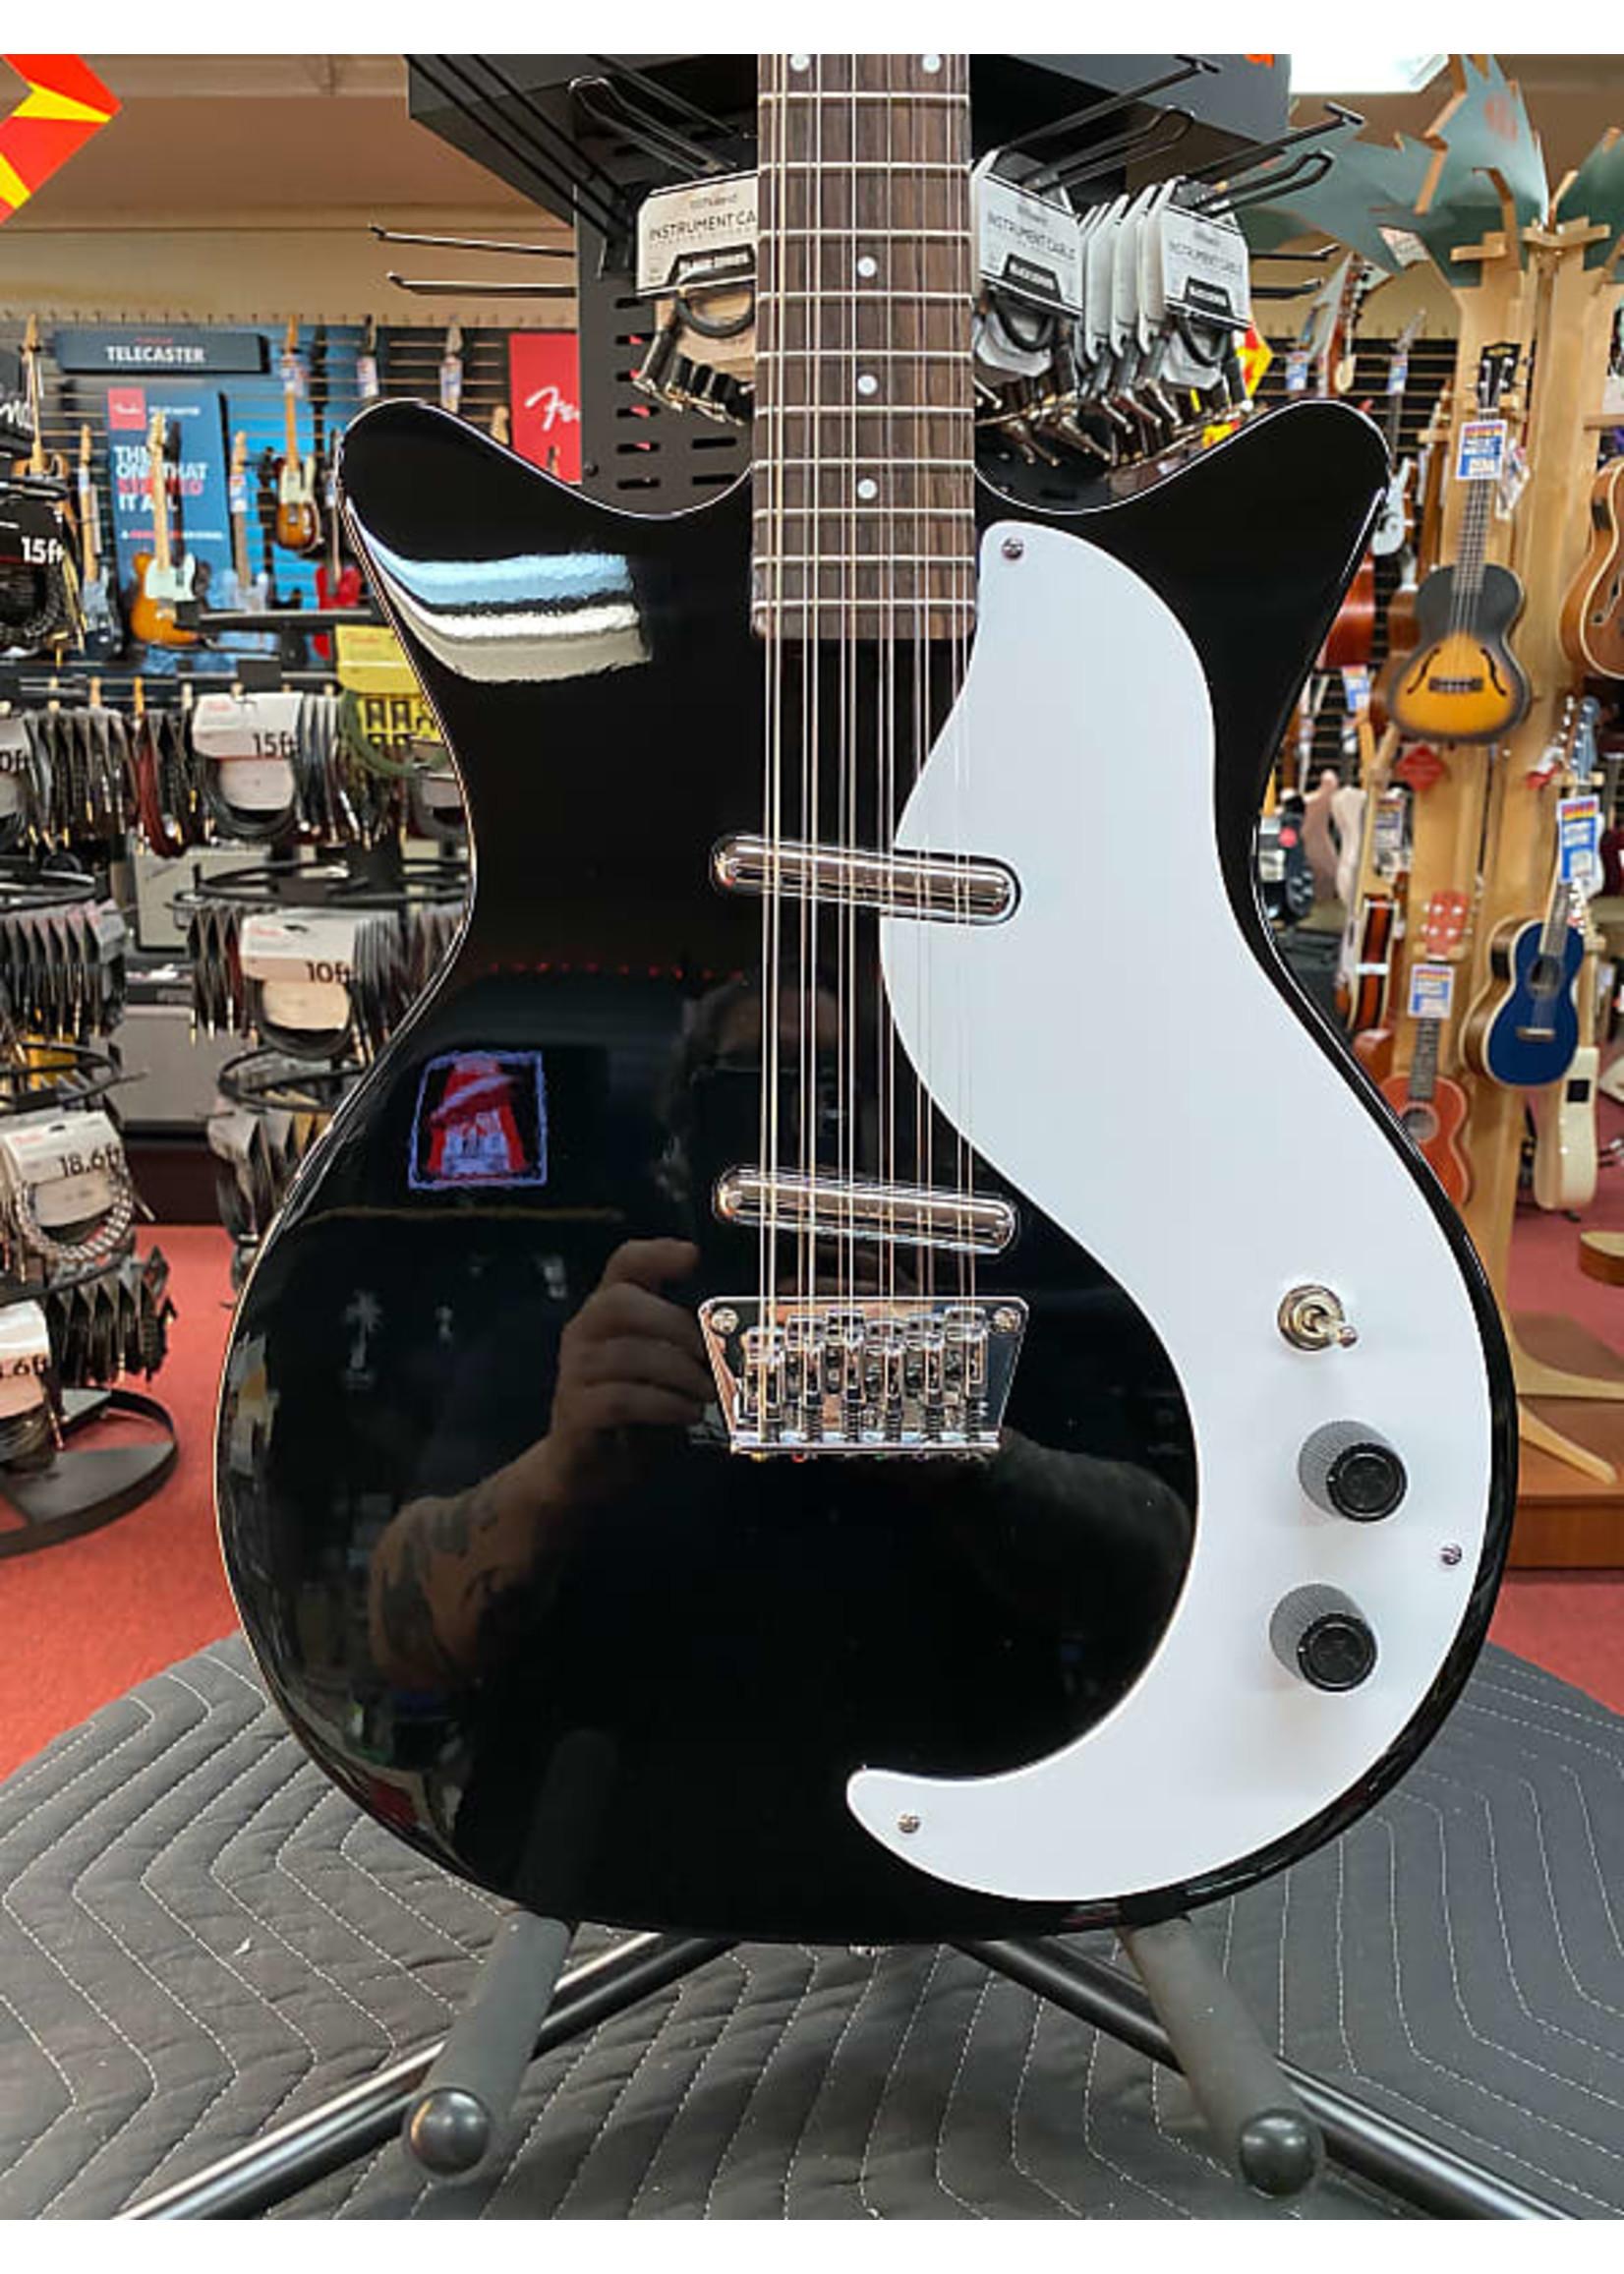 Danelectro Danelectro Vintage 12 String Electric Guitar - Black